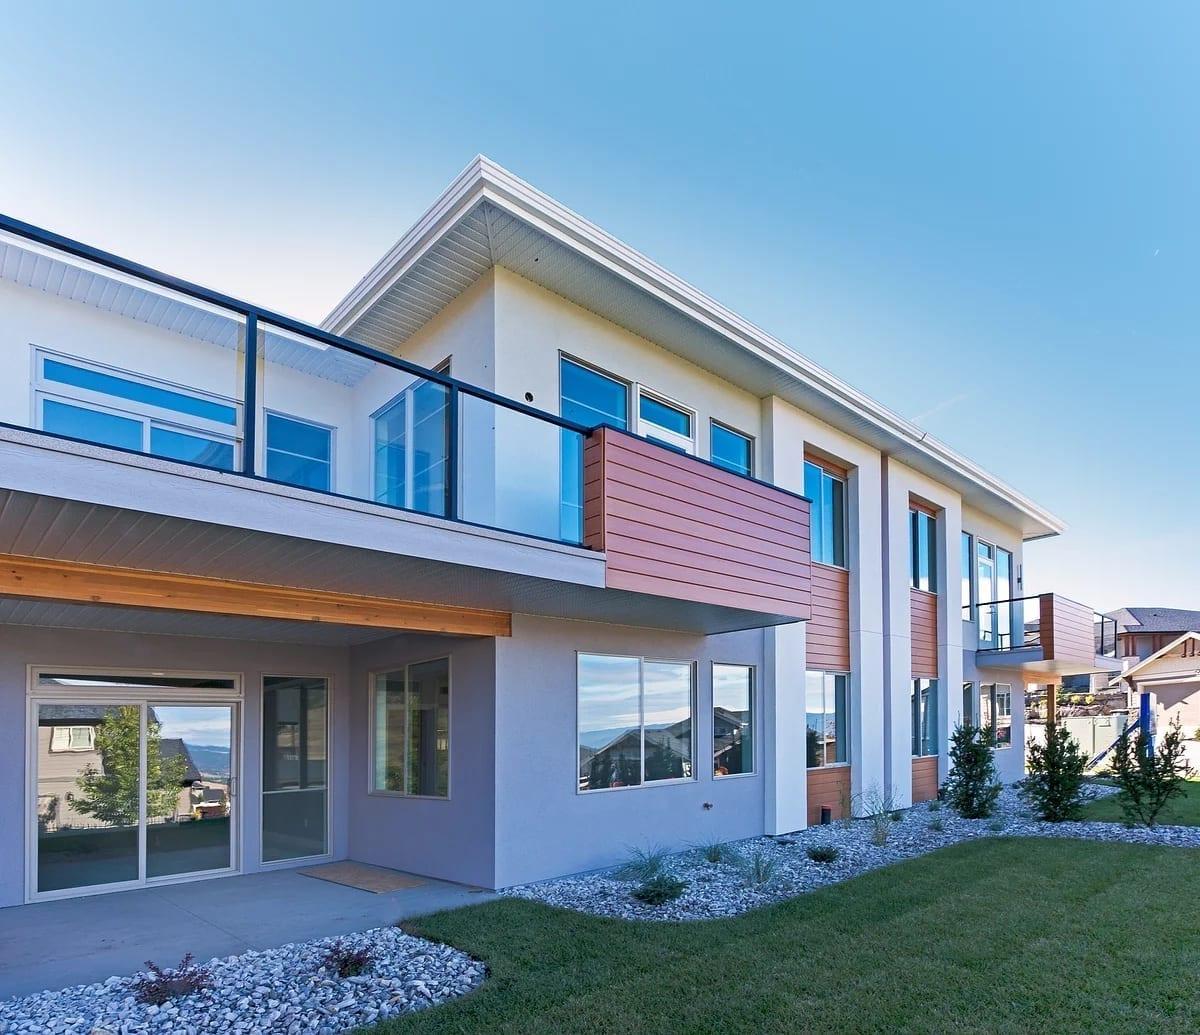 Dunbar Villas contemporary exterior, built by Impact Builders